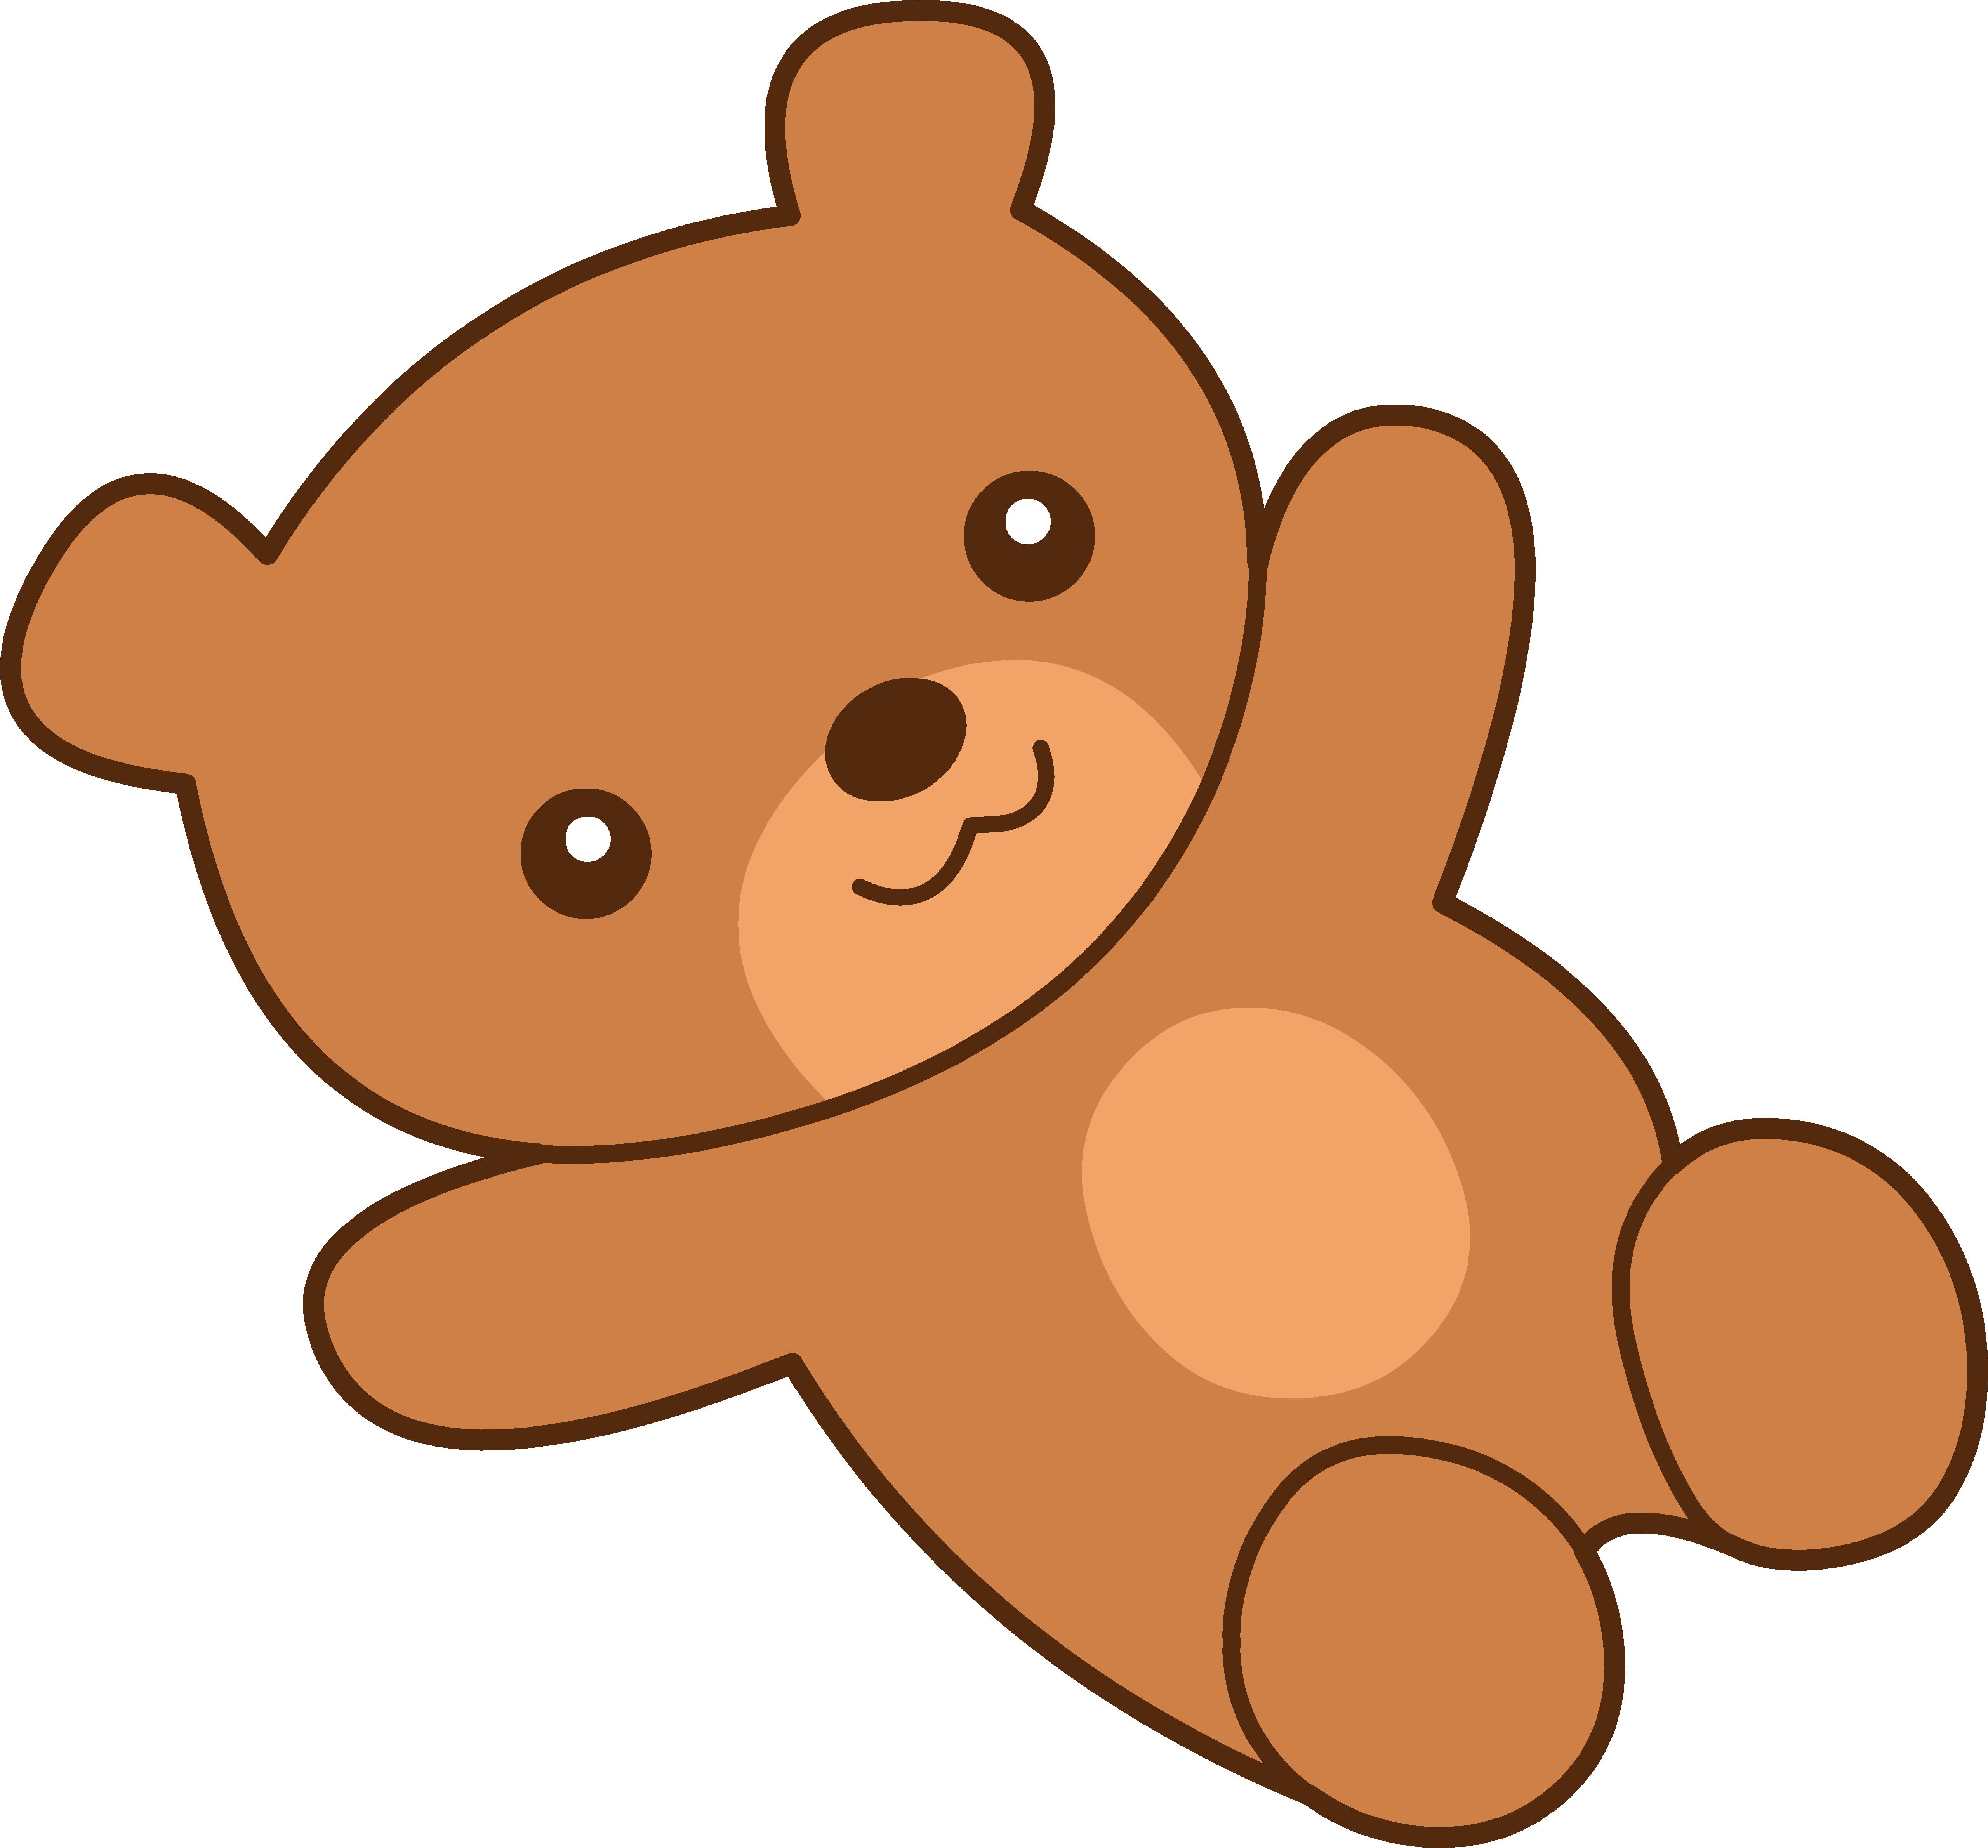 5120x4760 Free Teddy Bear Clipart